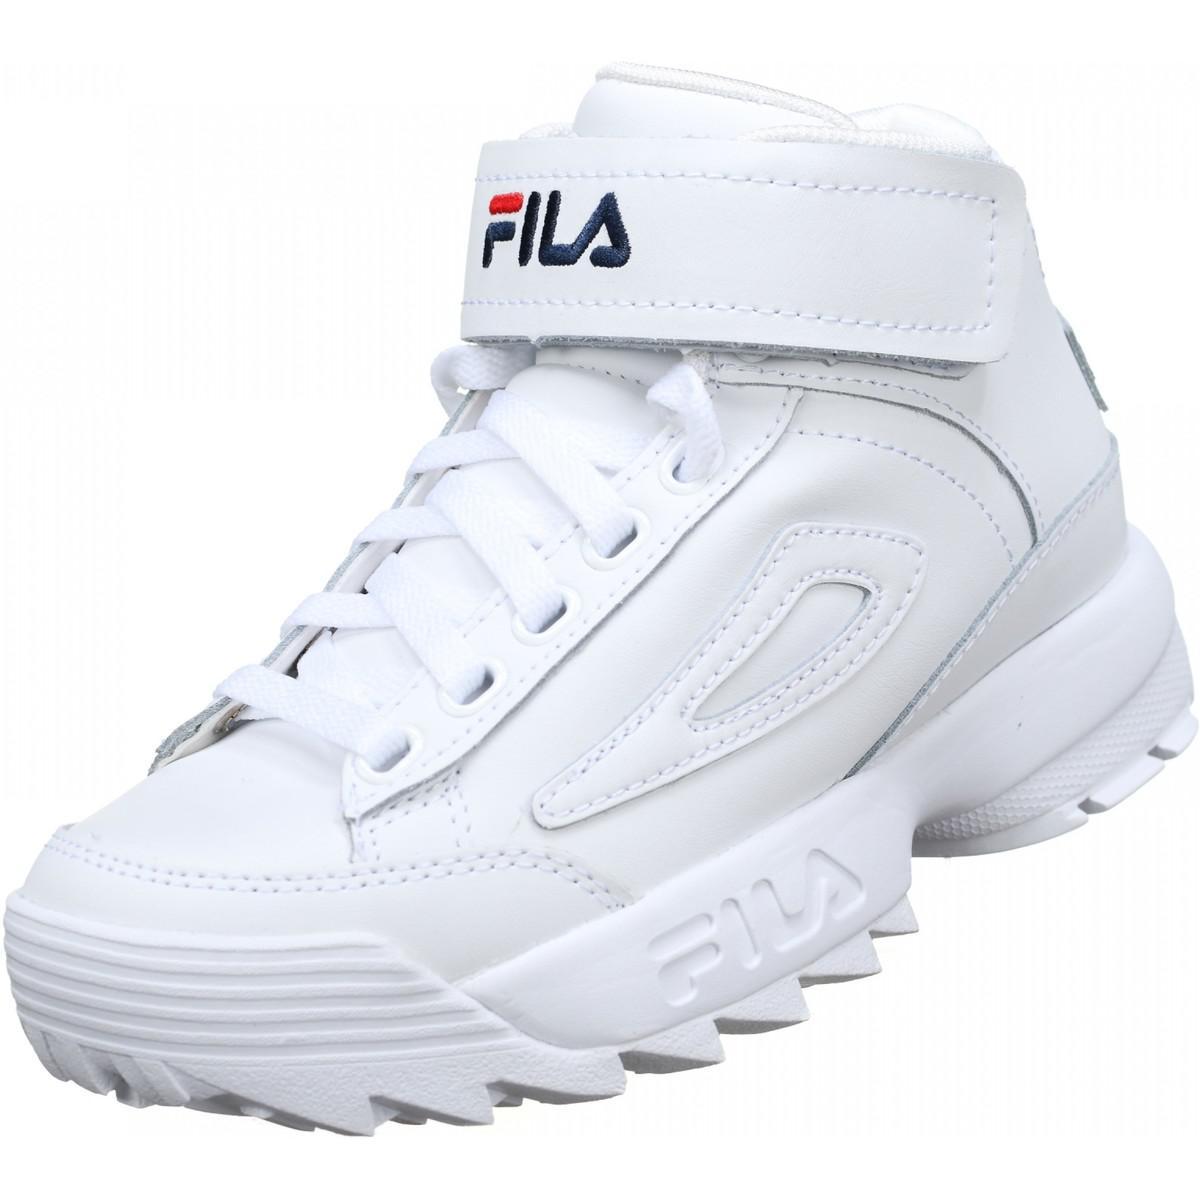 Chaussures Blanc Femmes Fila En Coloris Femme Basket Disruptor 0nvmwon8 76bfYgy